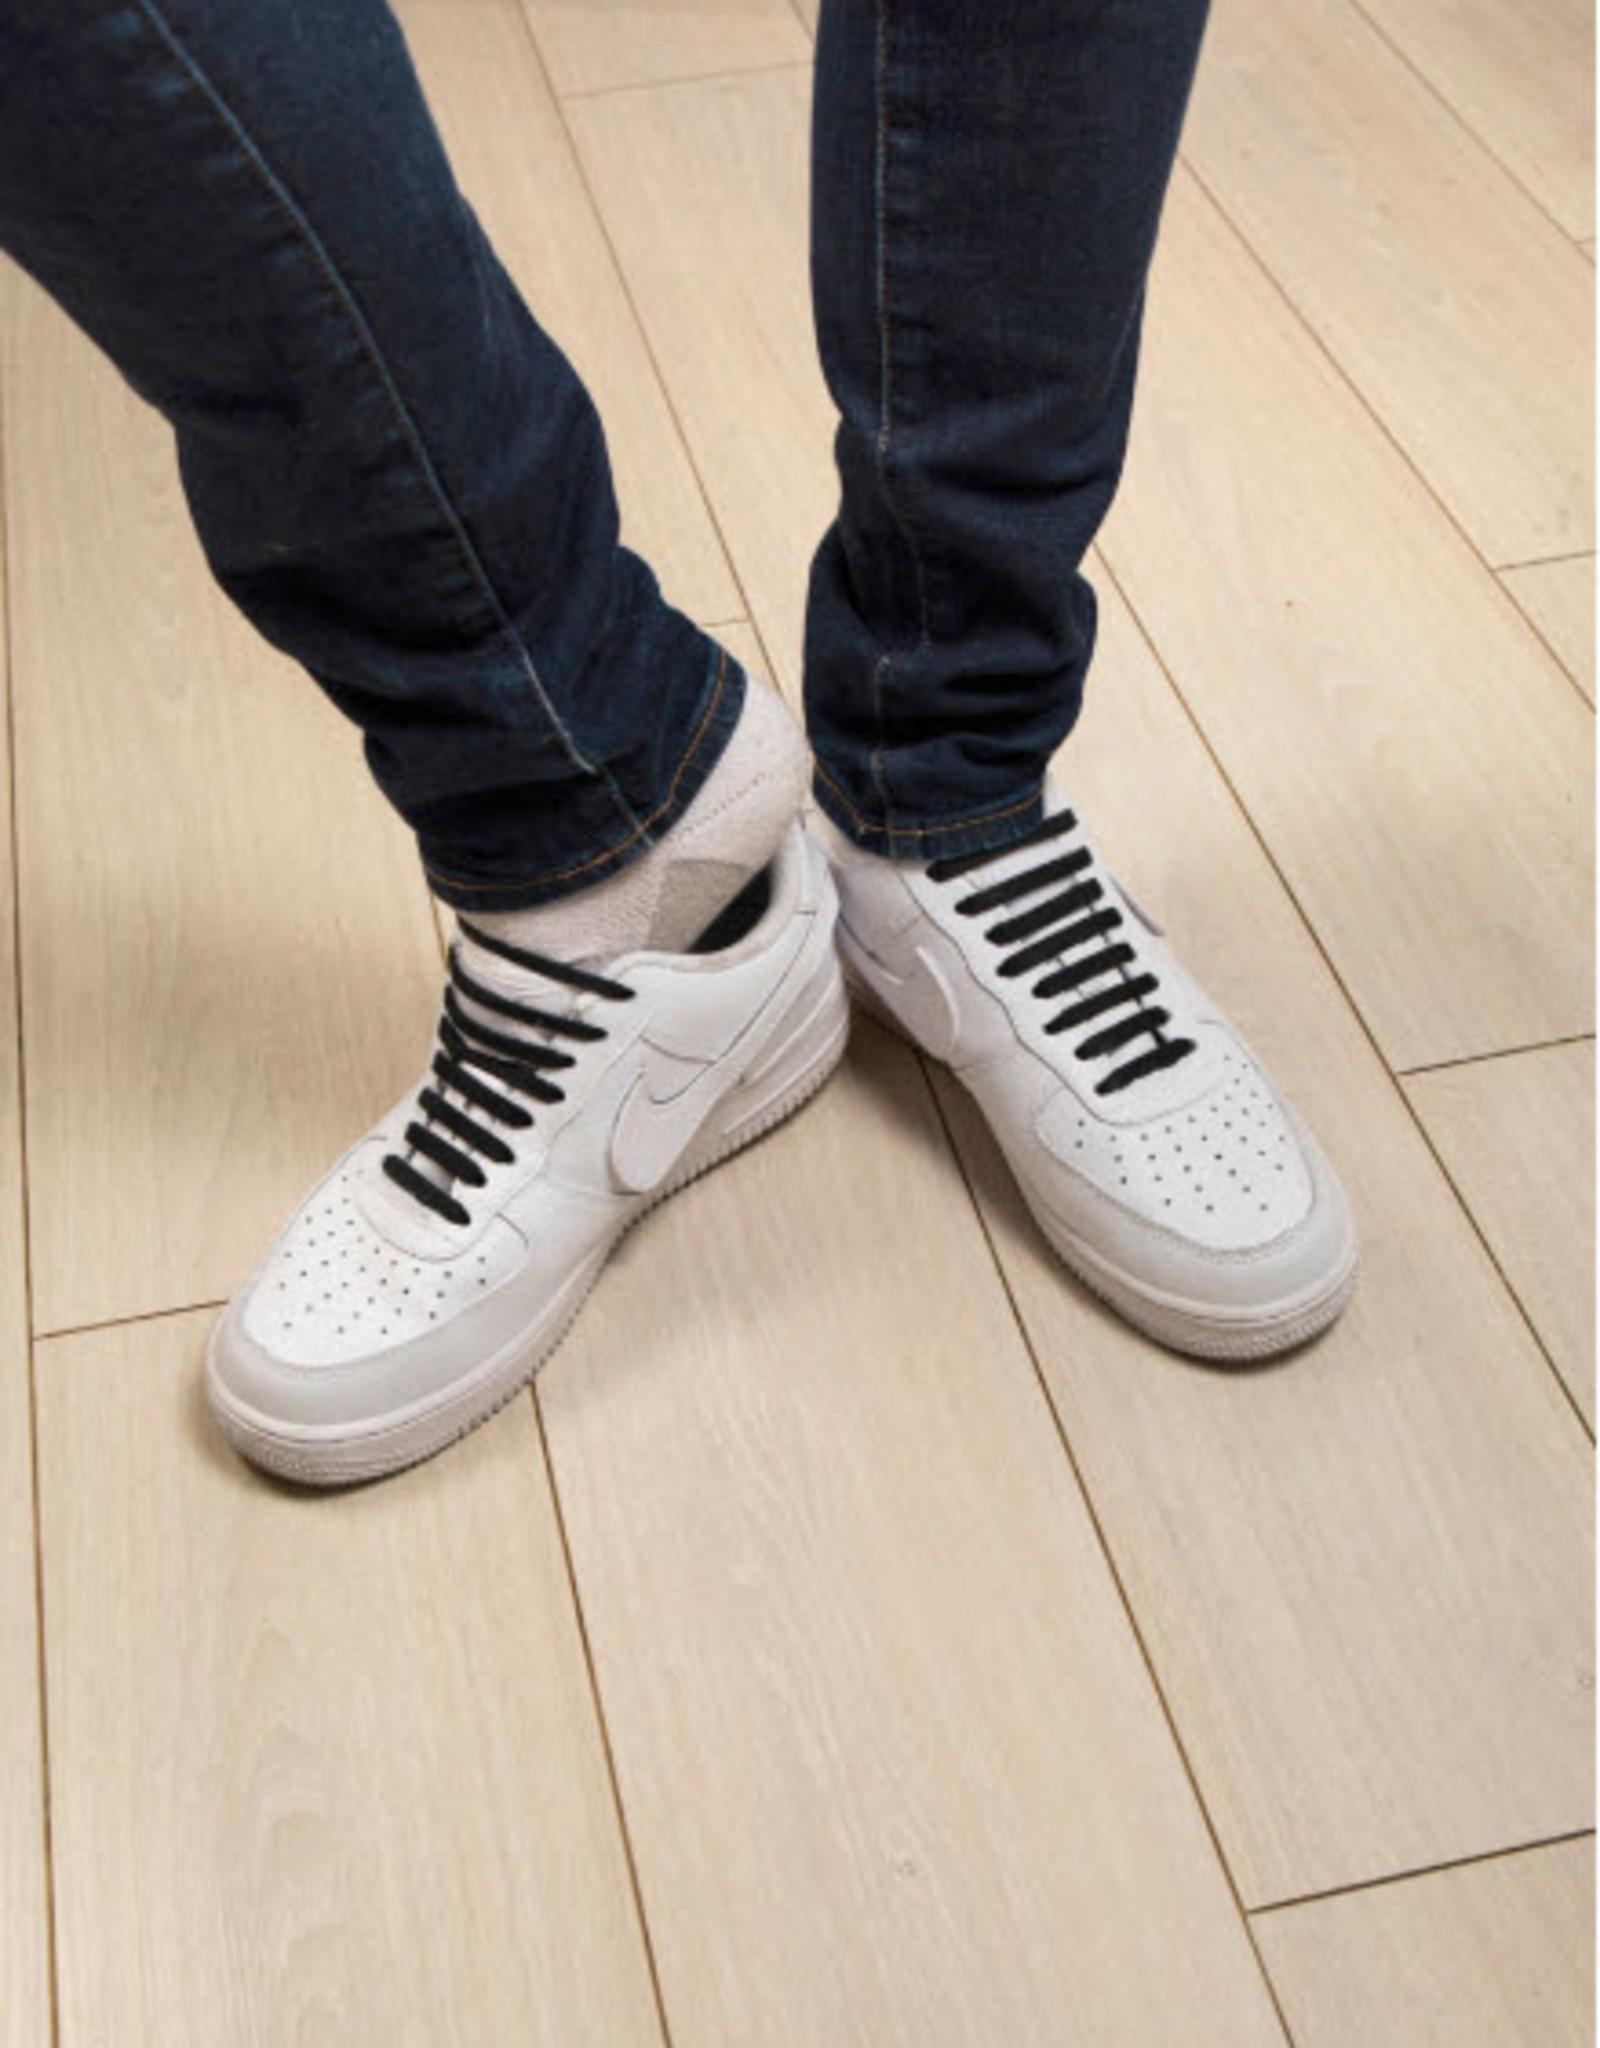 Kikkerland No Tie Shoe Bands Zwart